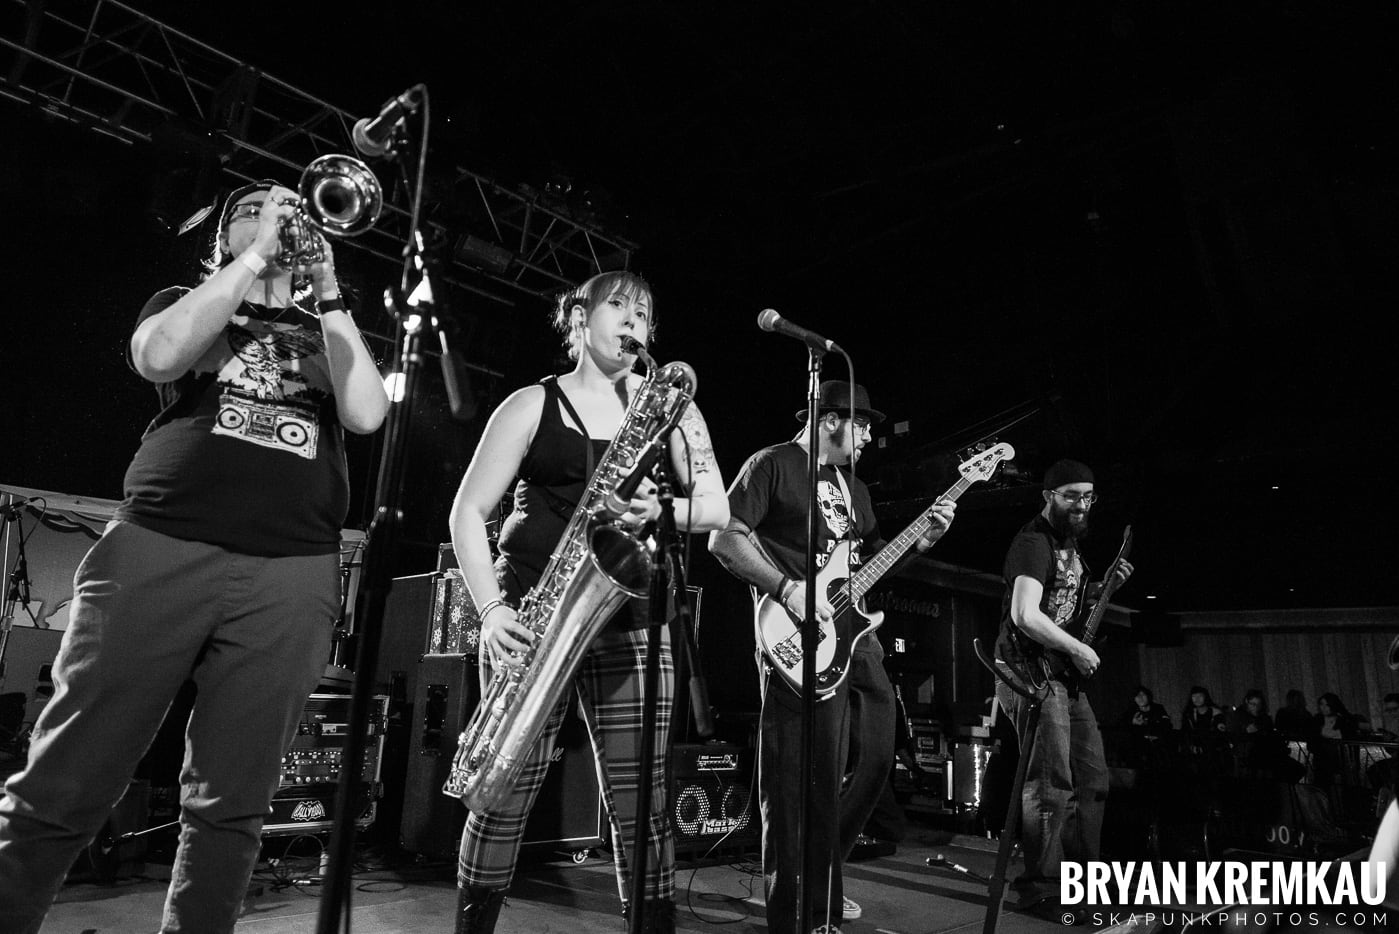 Backyard Superheroes @ Starland Ballroom, Sayreville, NJ - 11.23.18 (4)